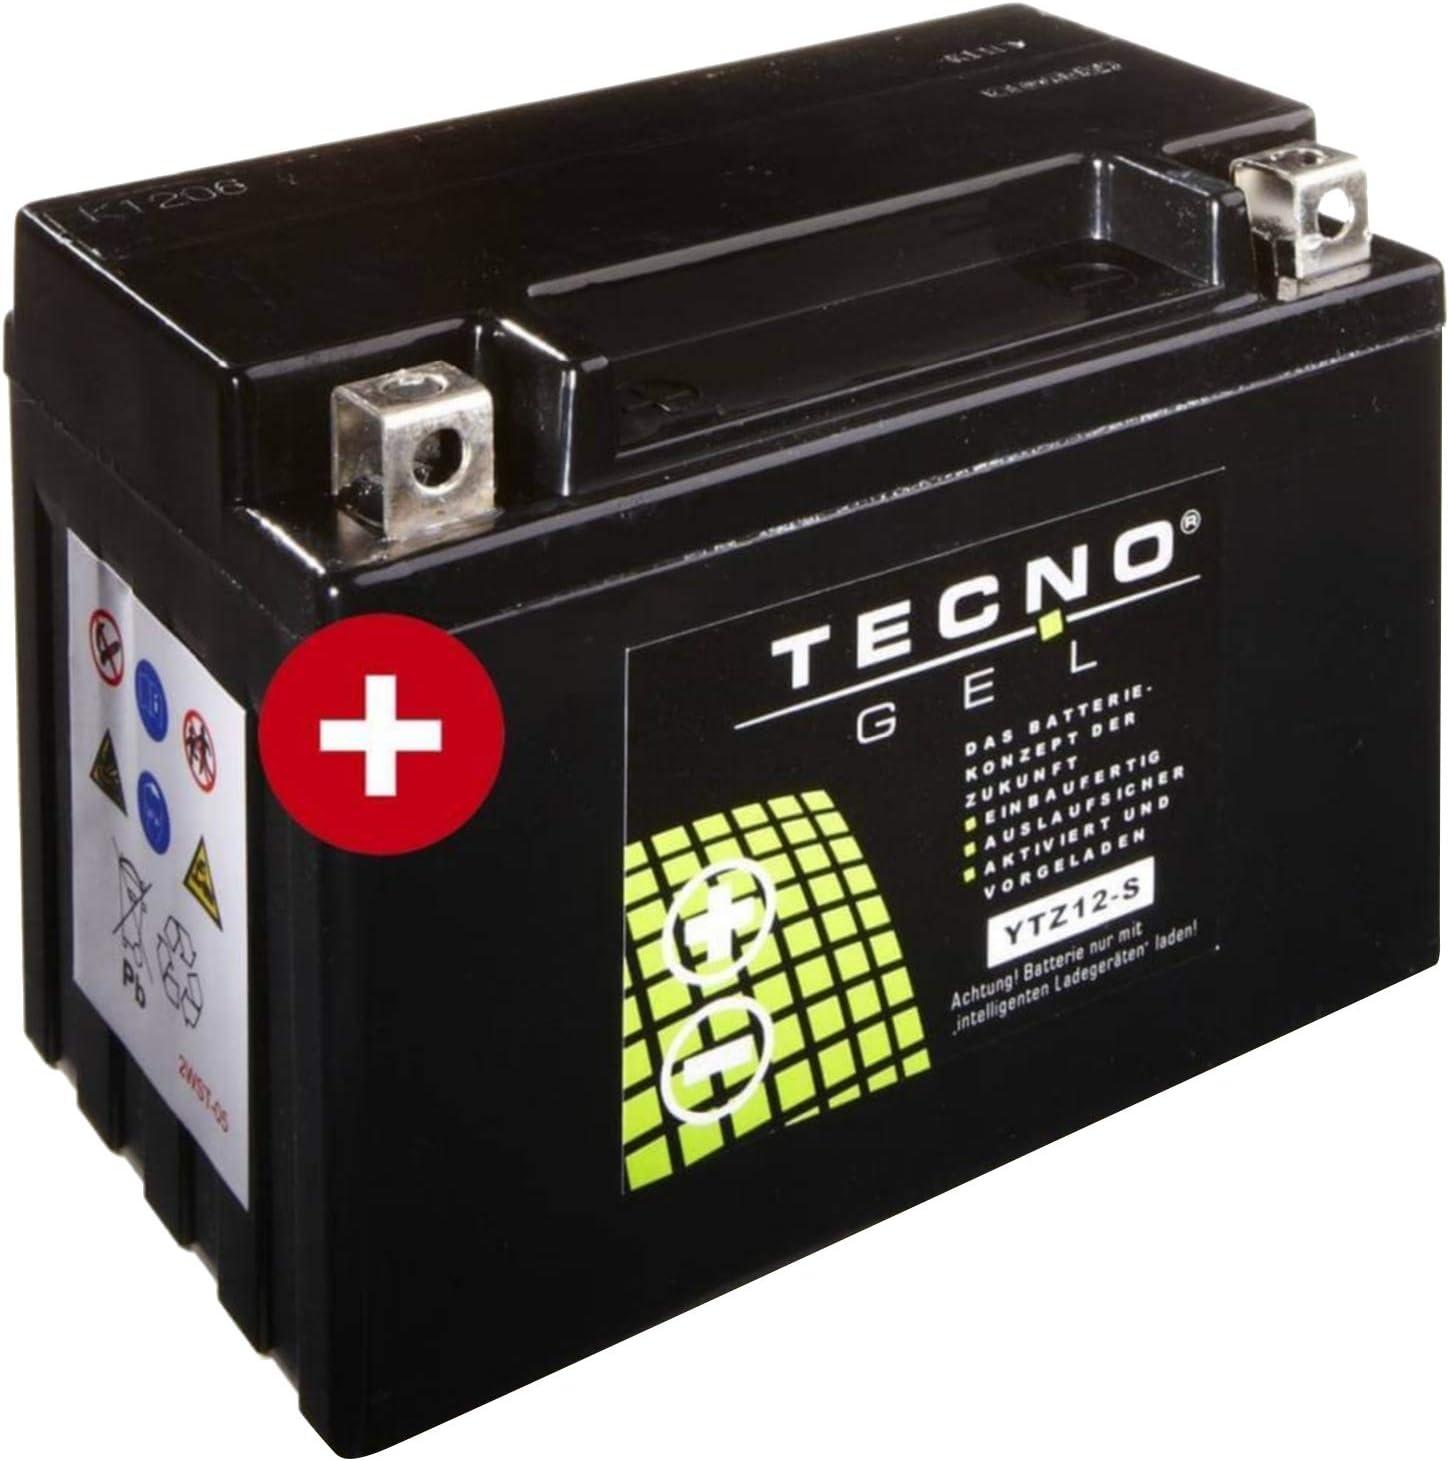 /2010/de Tecno Gel Bater/ía YTZ12S Honda VFR 800/2002/